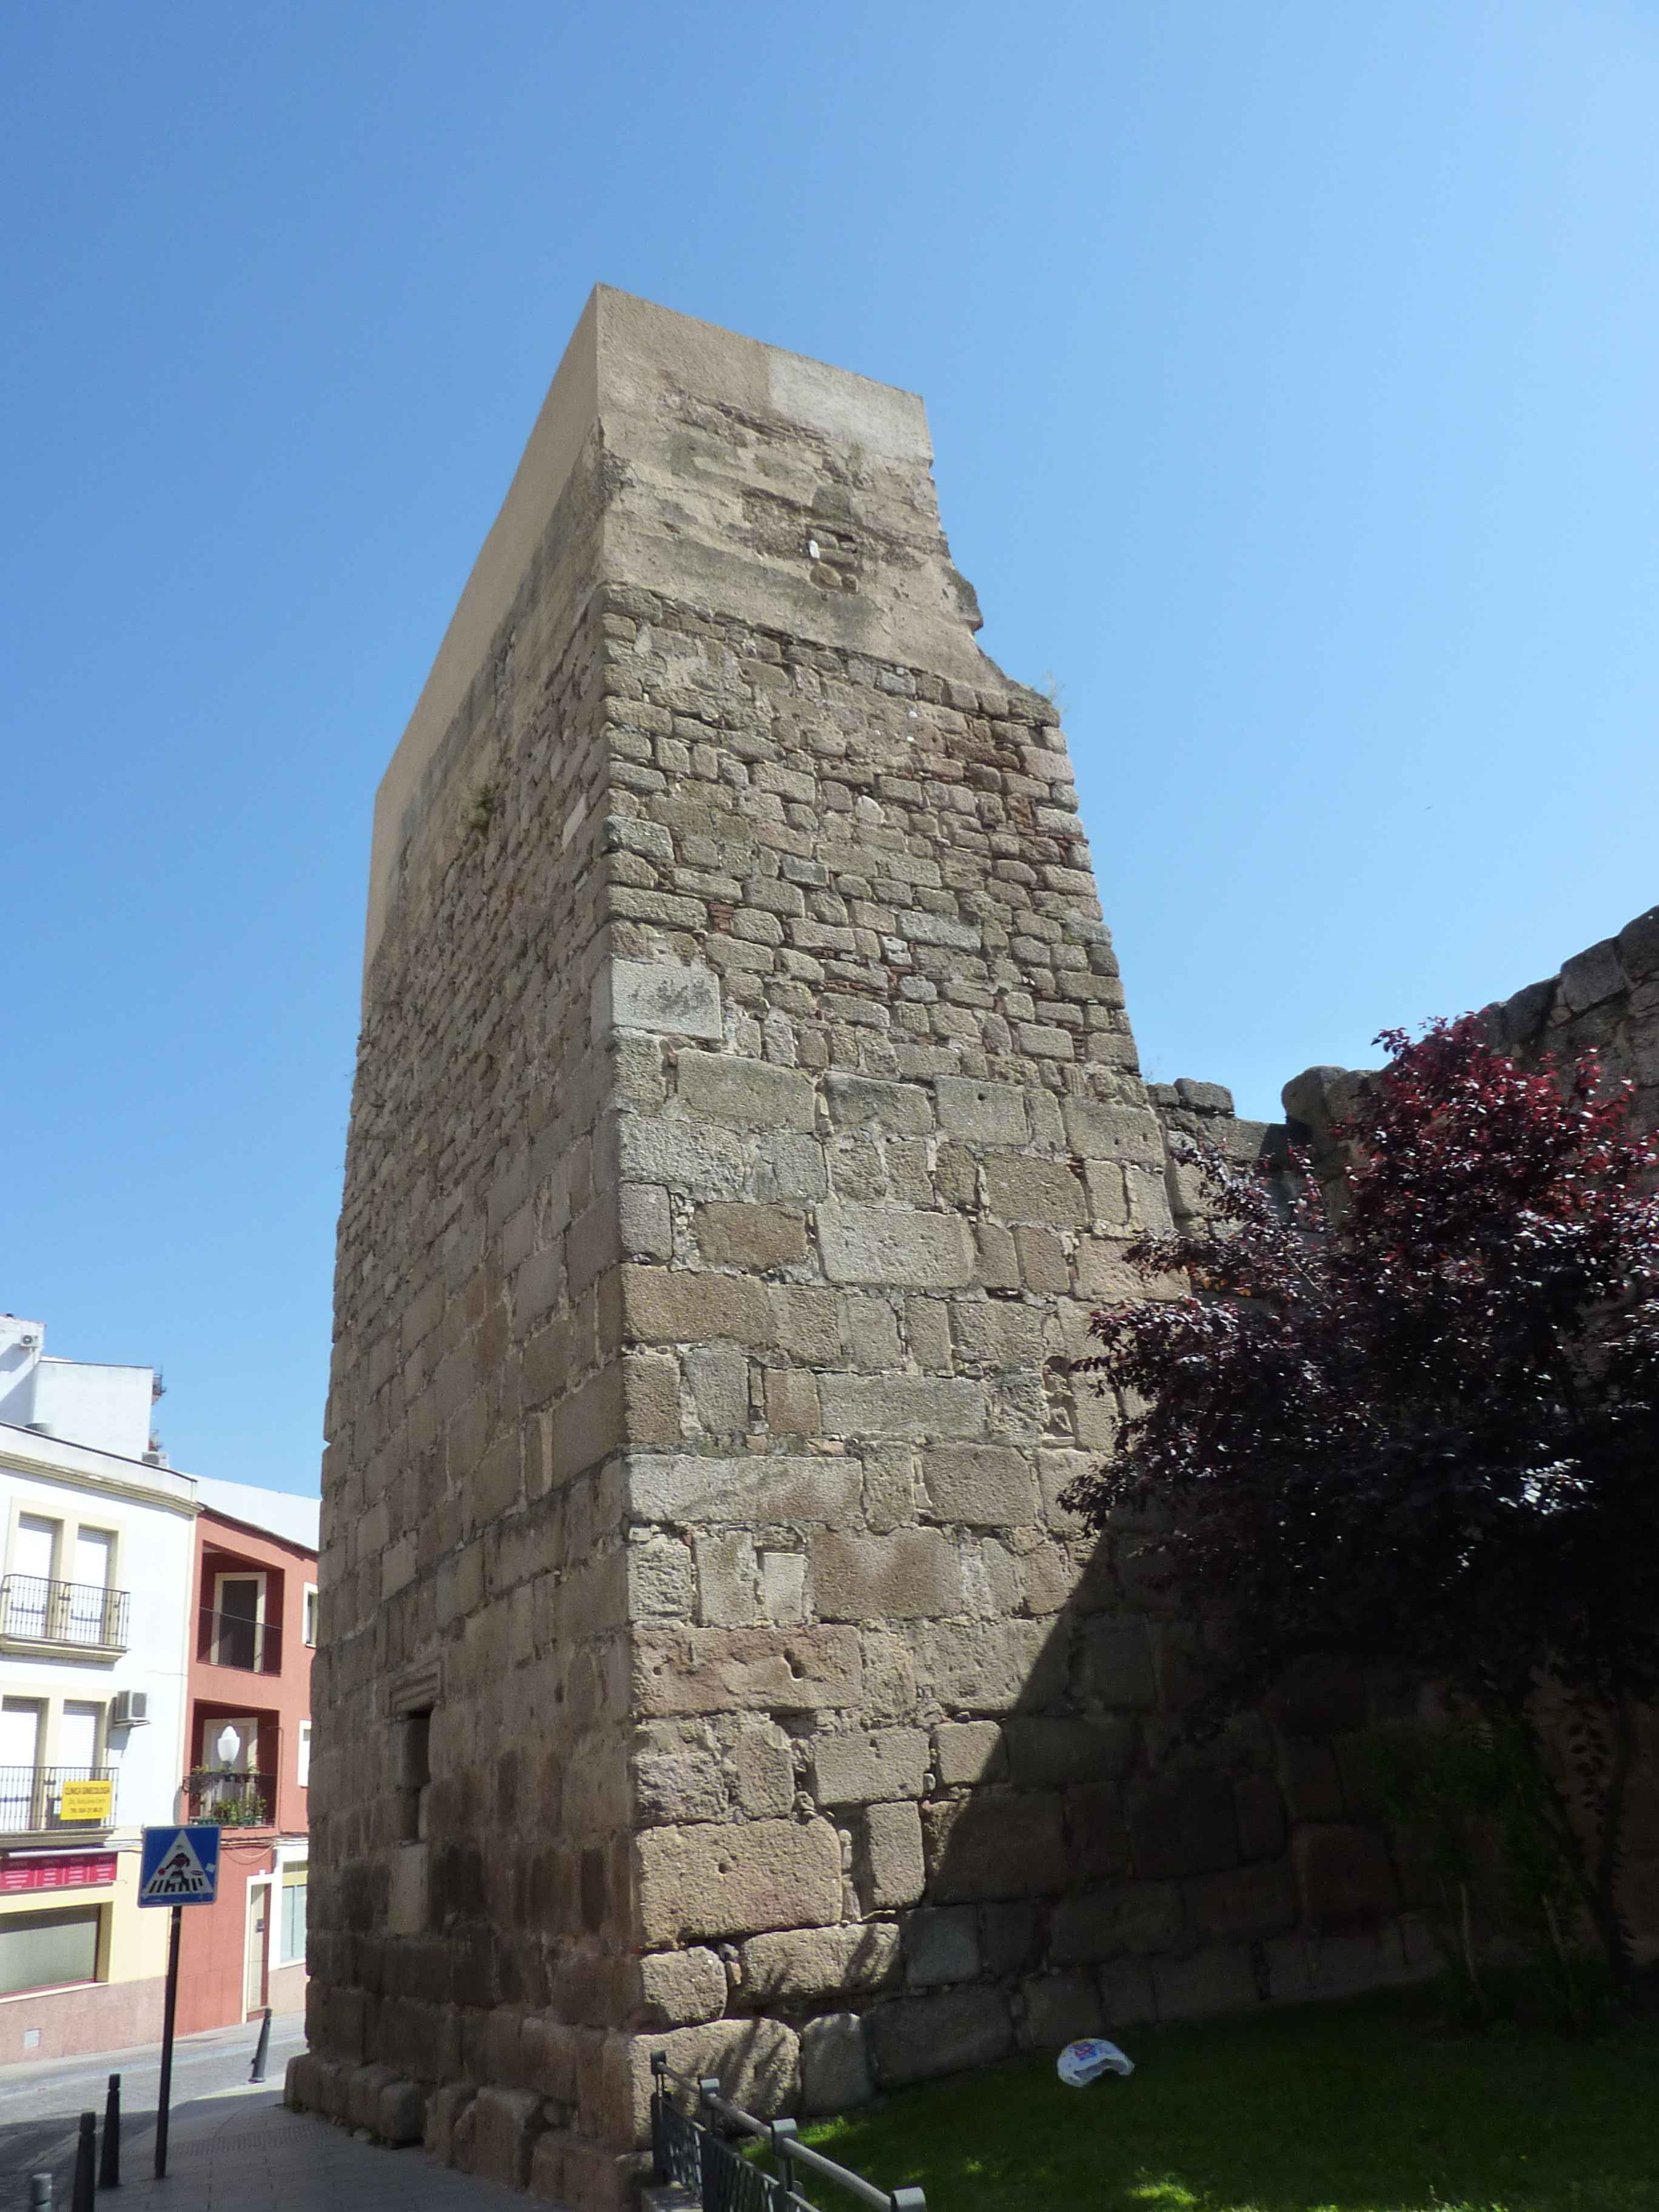 La Visite De Merida En Images Avec Ruines Romaines